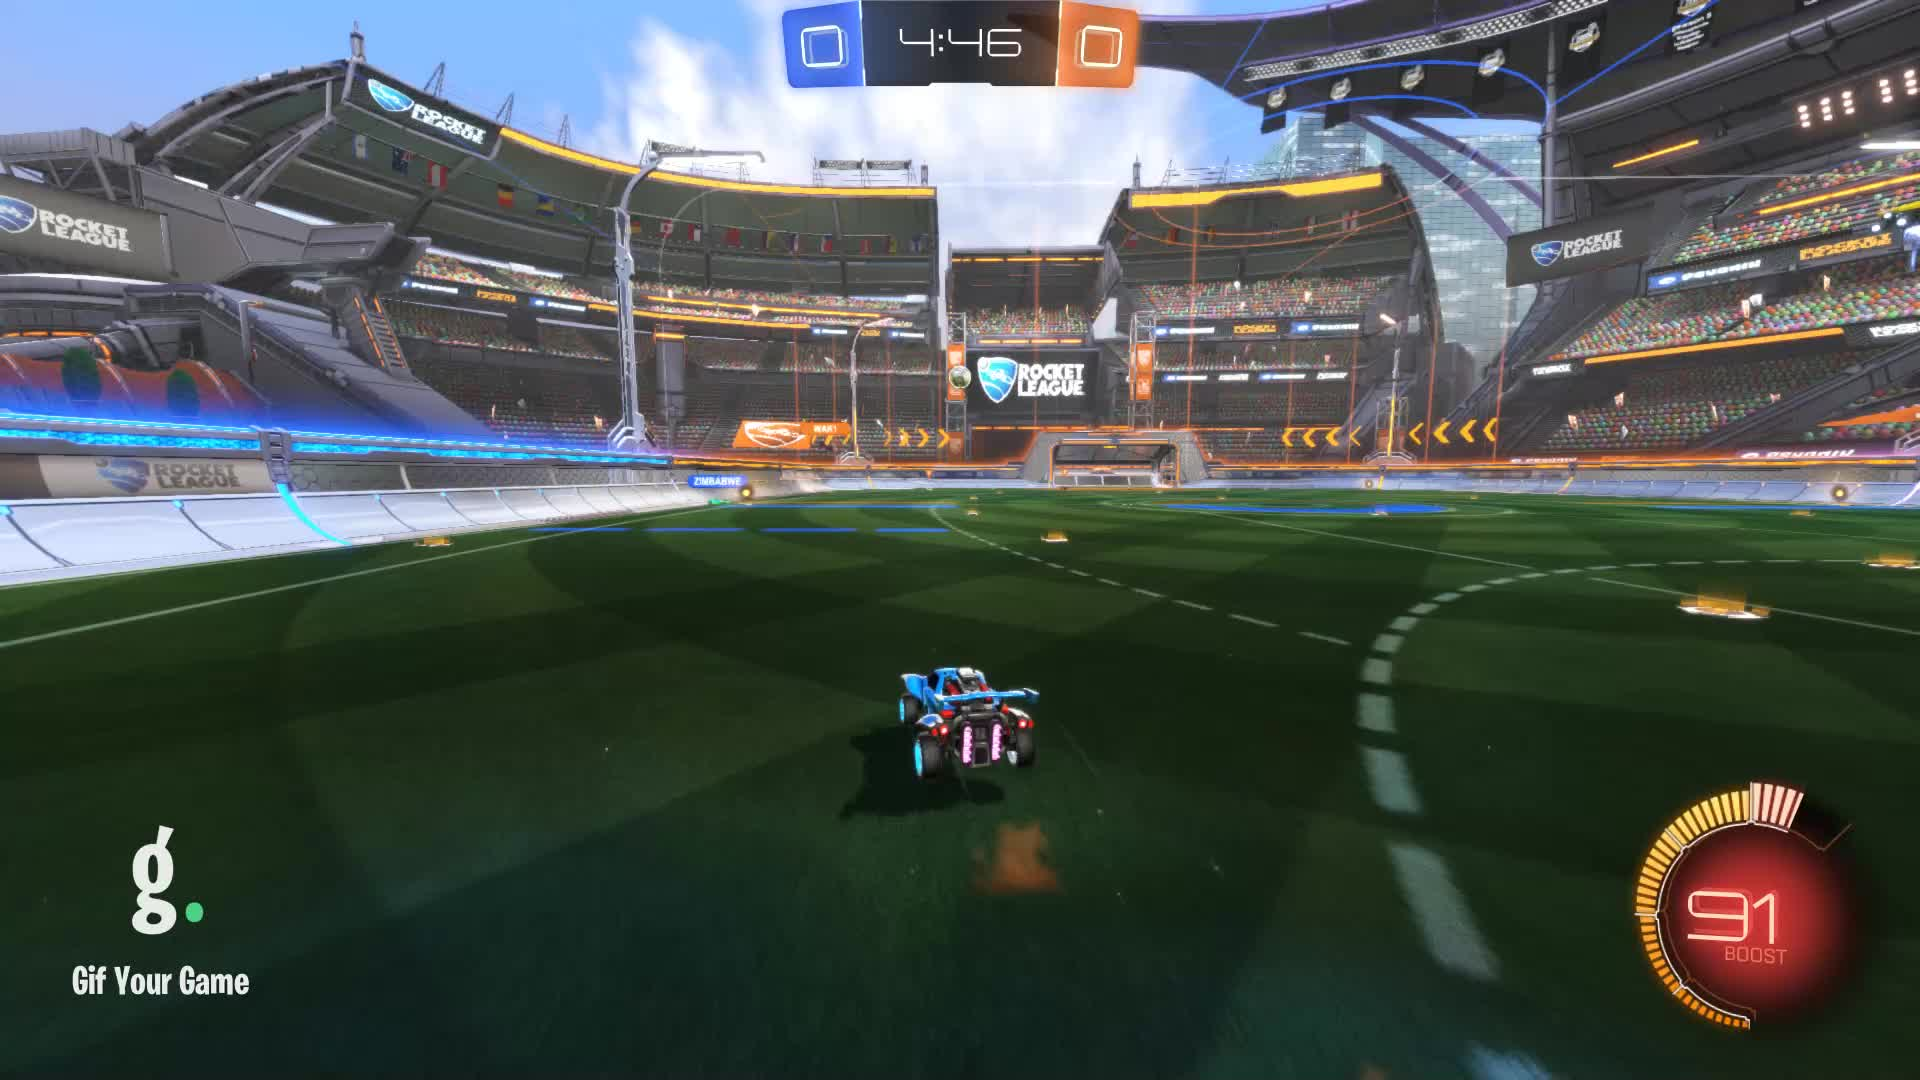 Gif Your Game, GifYourGame, Goal, Rocket League, RocketLeague, snus, Goal 1: snus GIFs